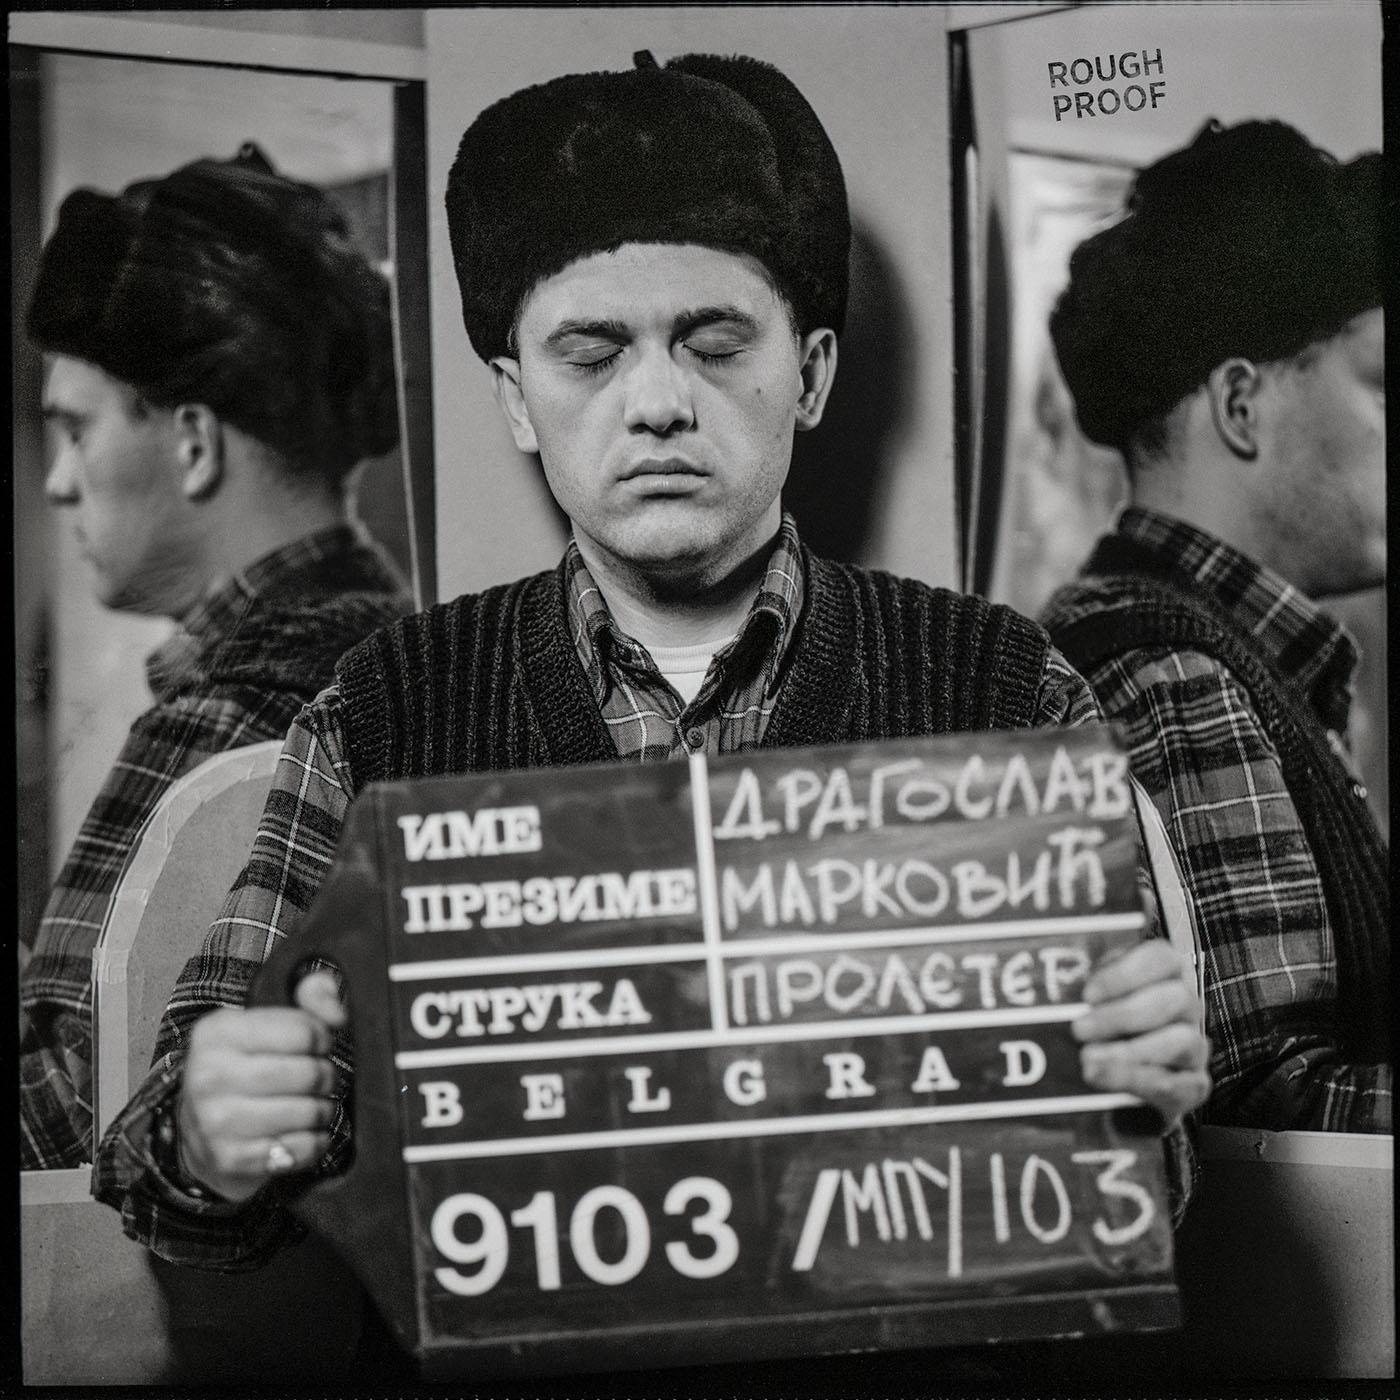 Markovic-Mug-Shot ©Stanislav Sharp (Djordje Milekic)